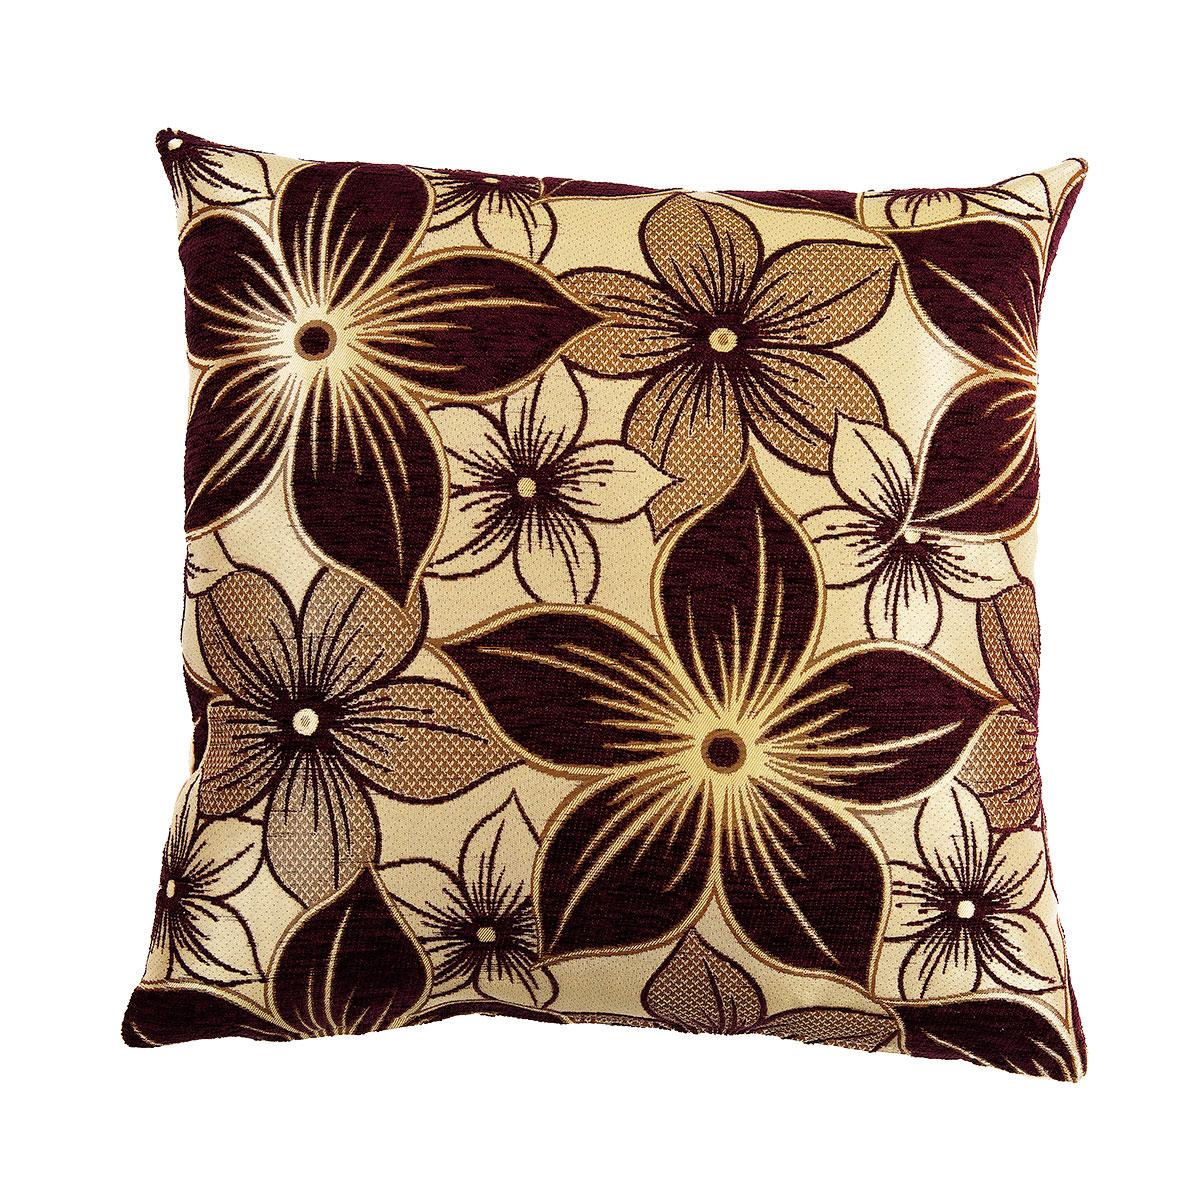 Chenille Jacquard Flowers Brown Gold Swirl Design Sw